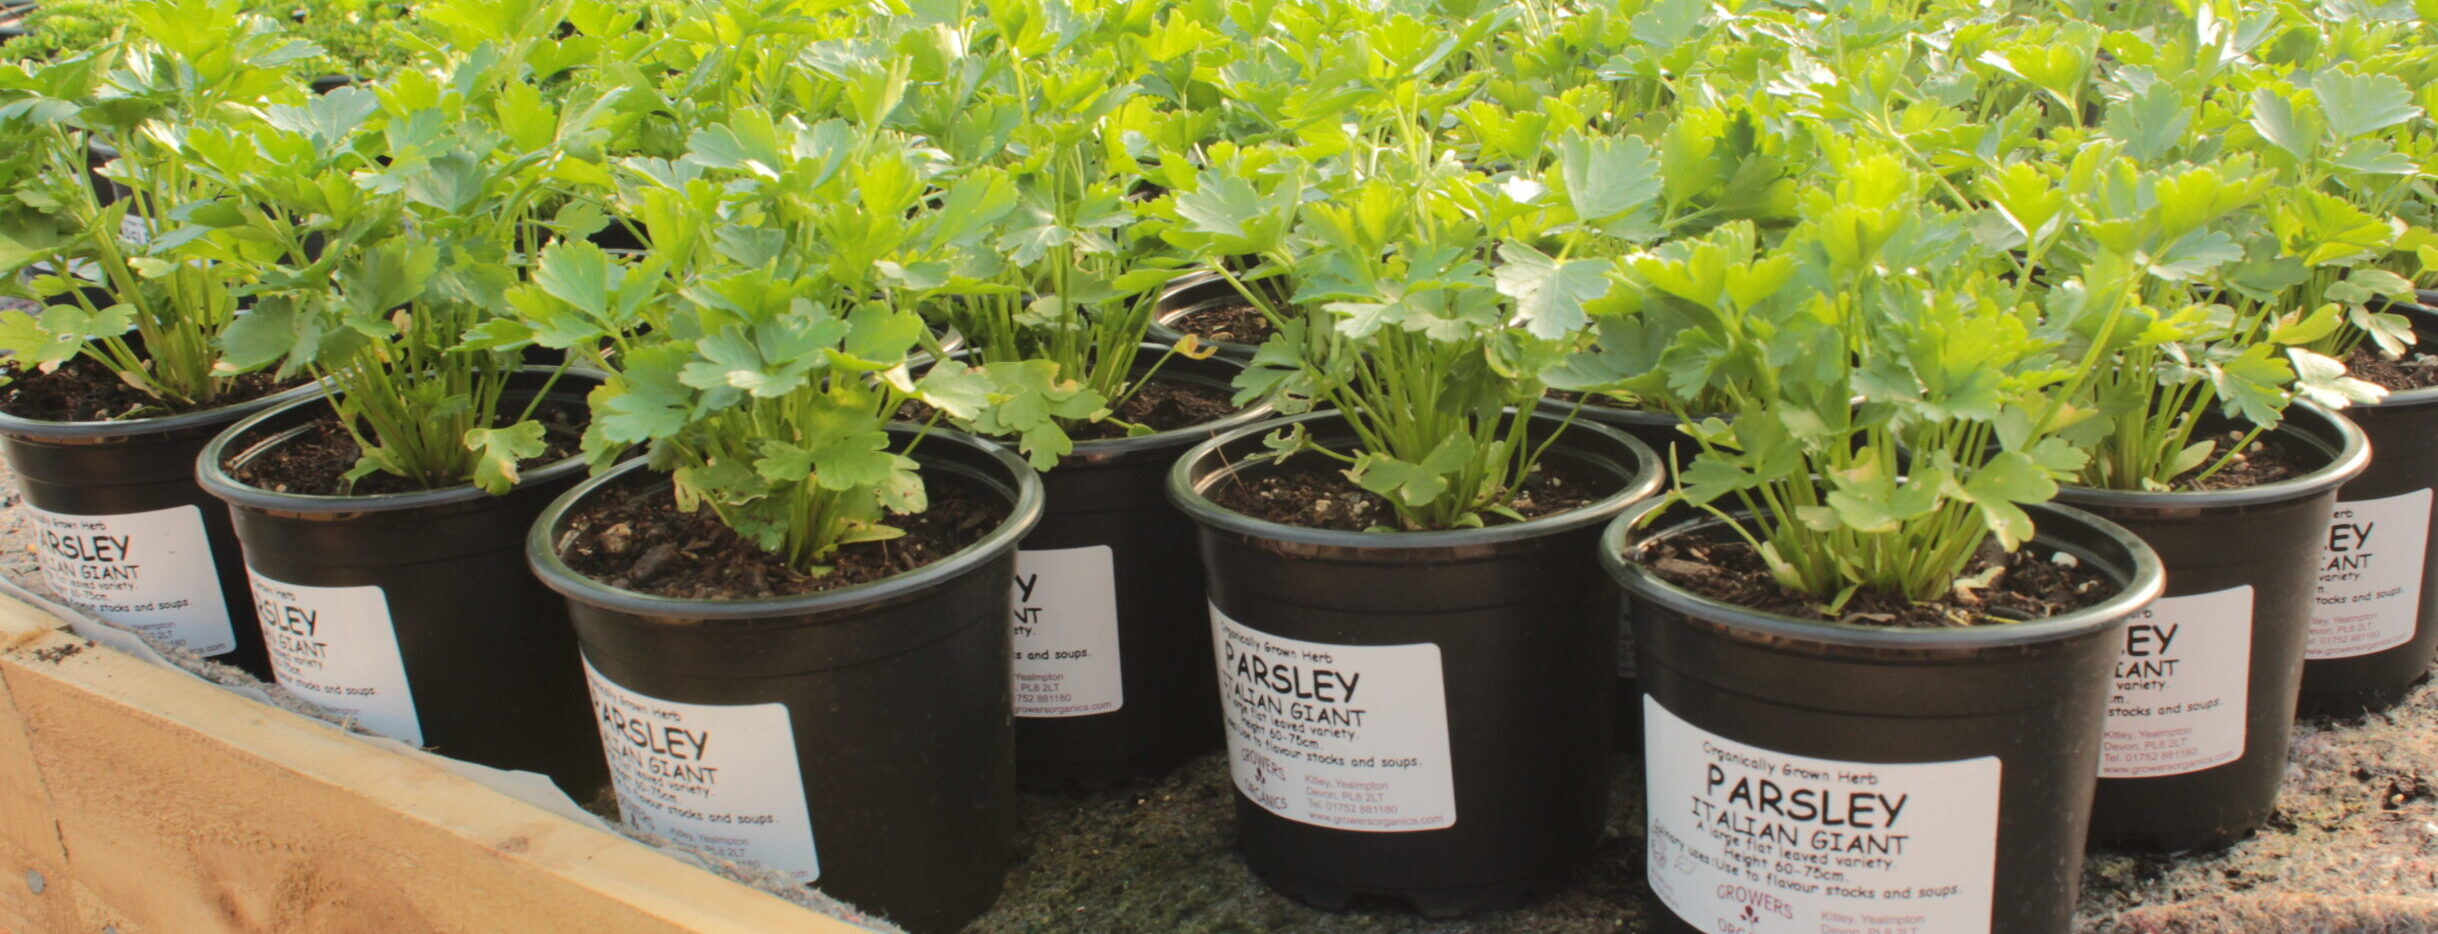 Organic Herbs Online Growers Organics